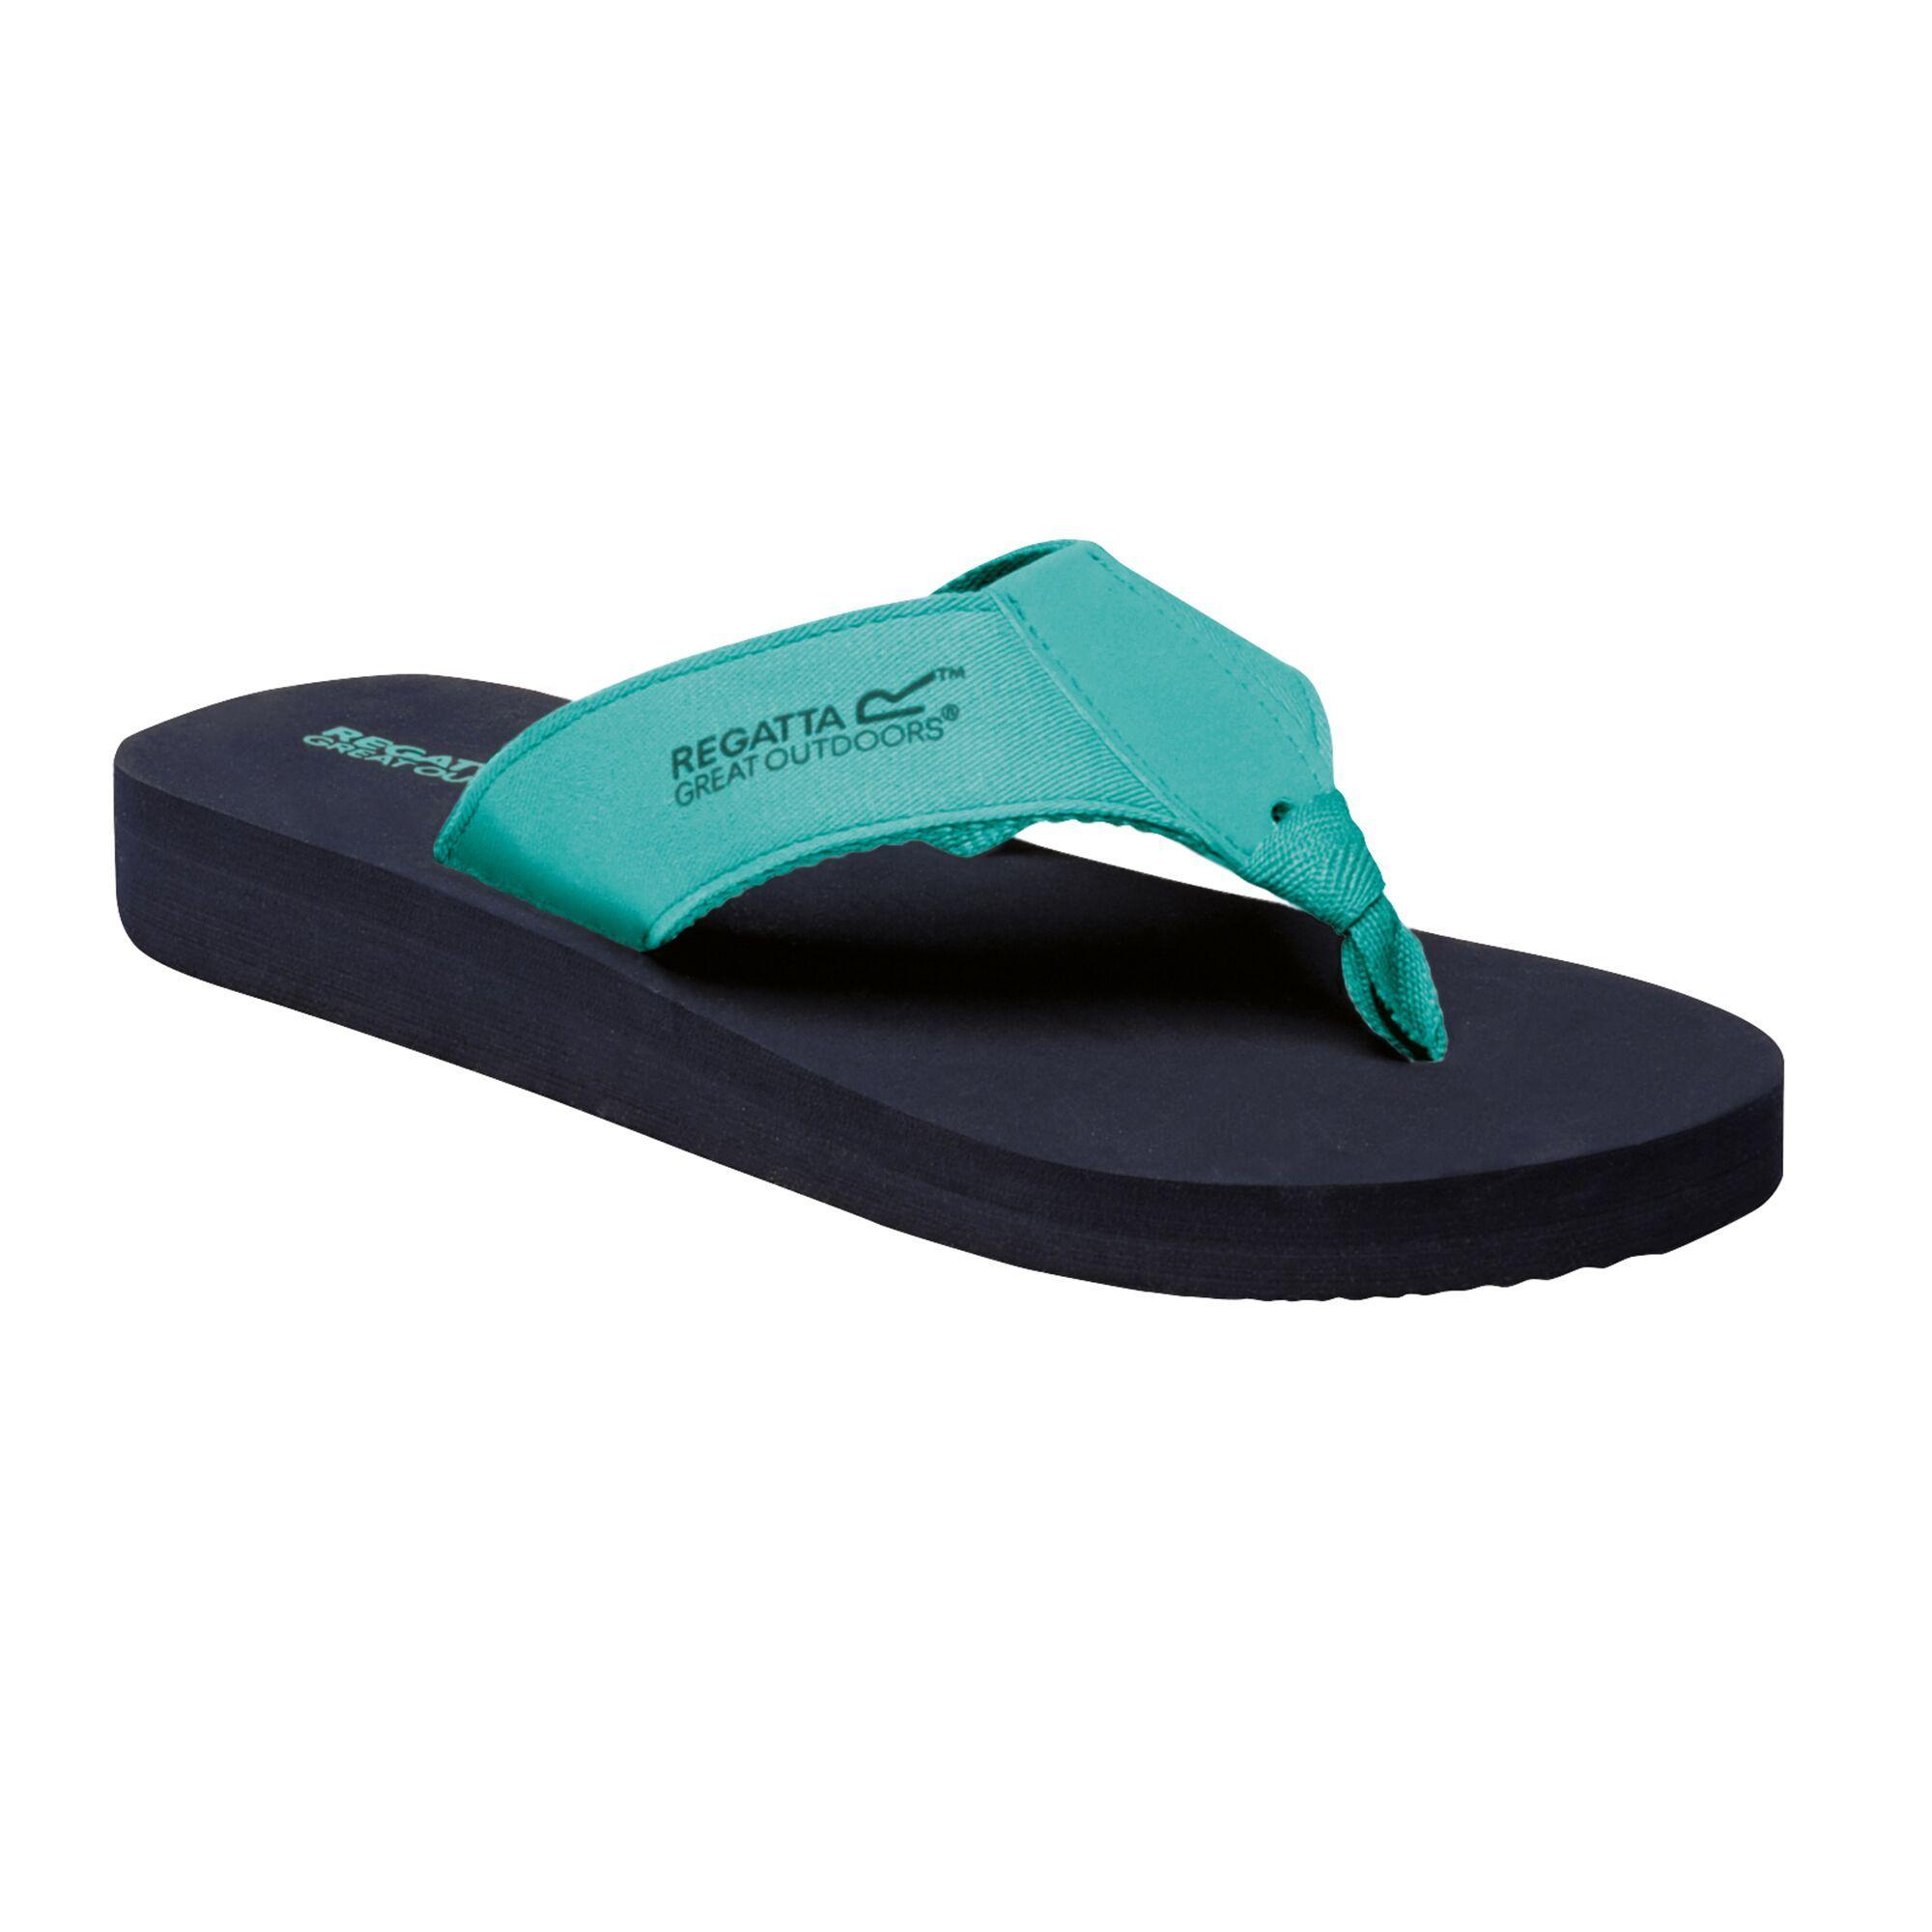 Regatta Womens/Ladies Catarina Flip Flops